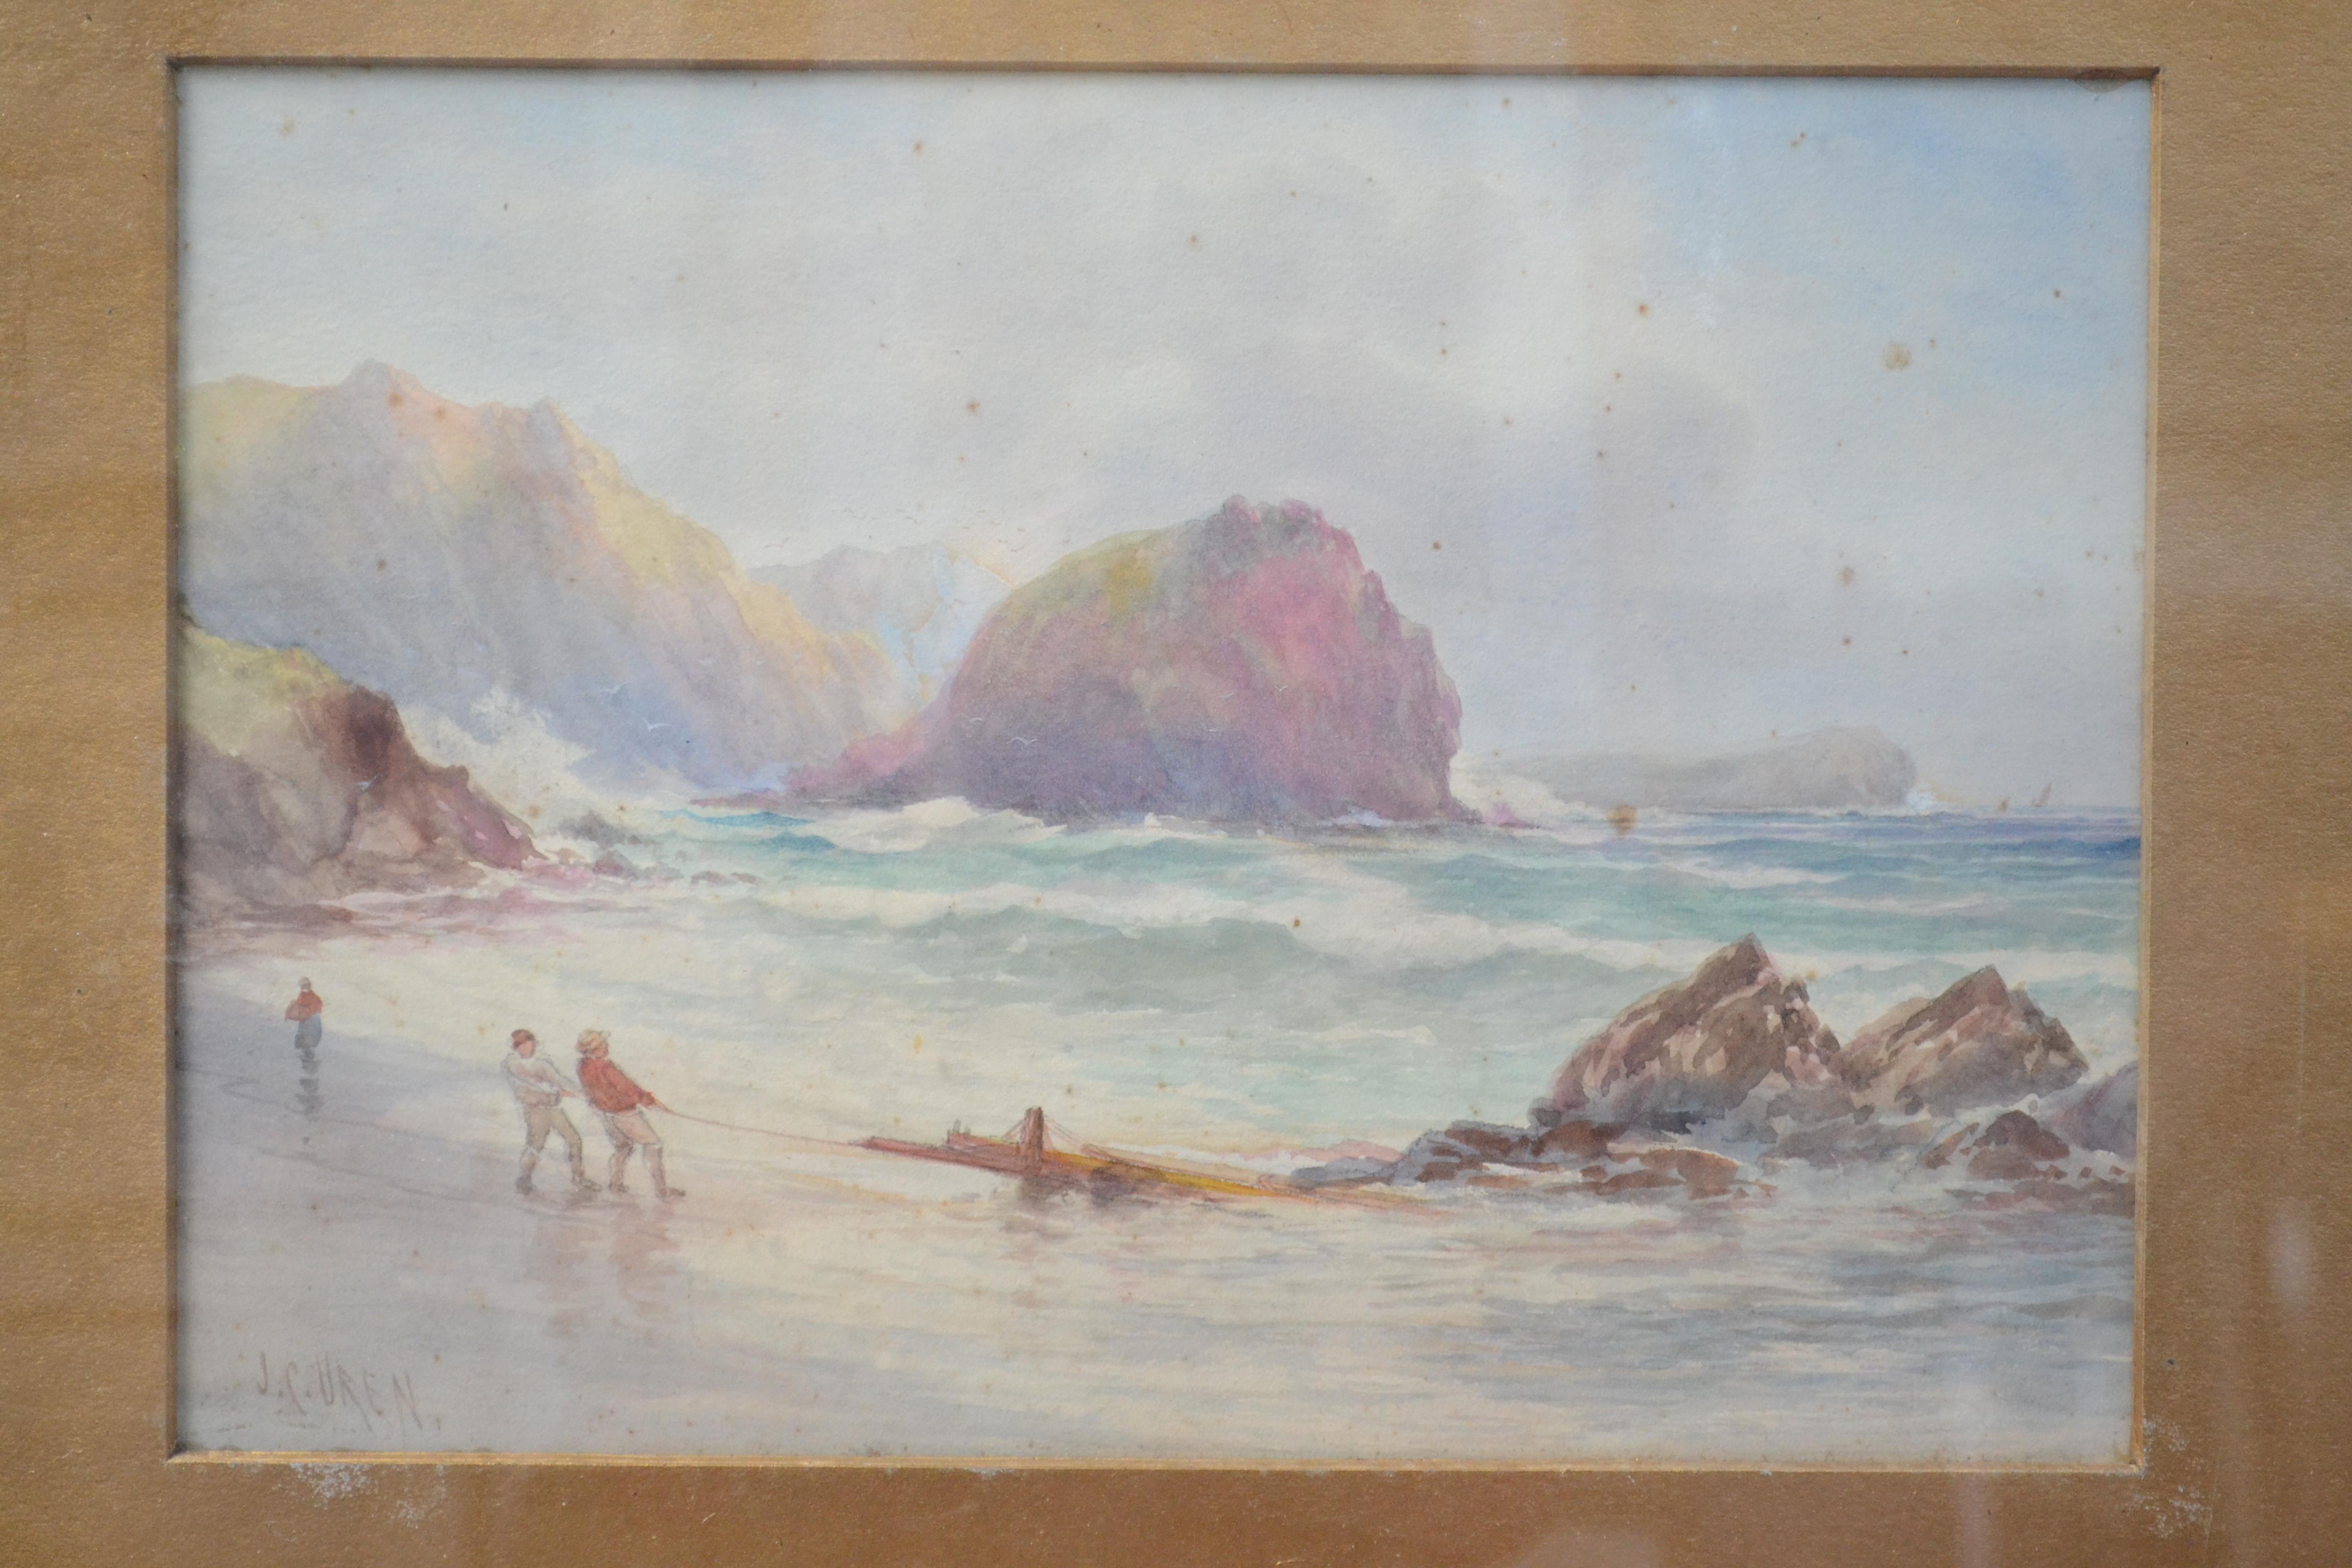 Lot 26 - JOHN CLARKE ISAAC UREN Retrieving From The Sea Watercolour Signed 34 x 24 cm